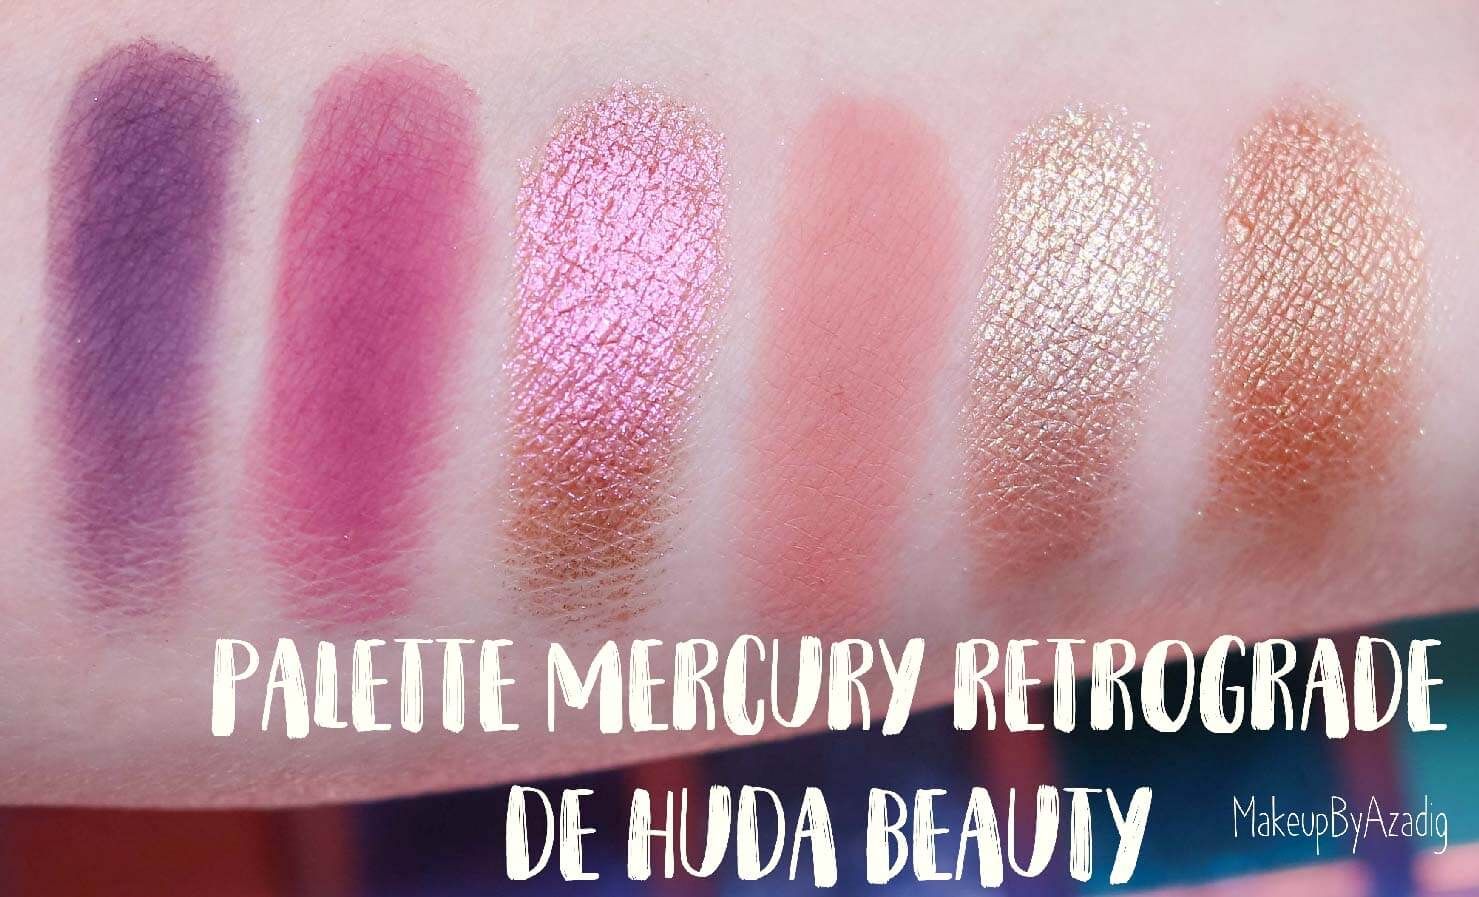 revue-palette-mercury-retrograde-huda-beauty-sephora-france-makeupbyazadig-avis-prix-swatch-astrologie-troisieme